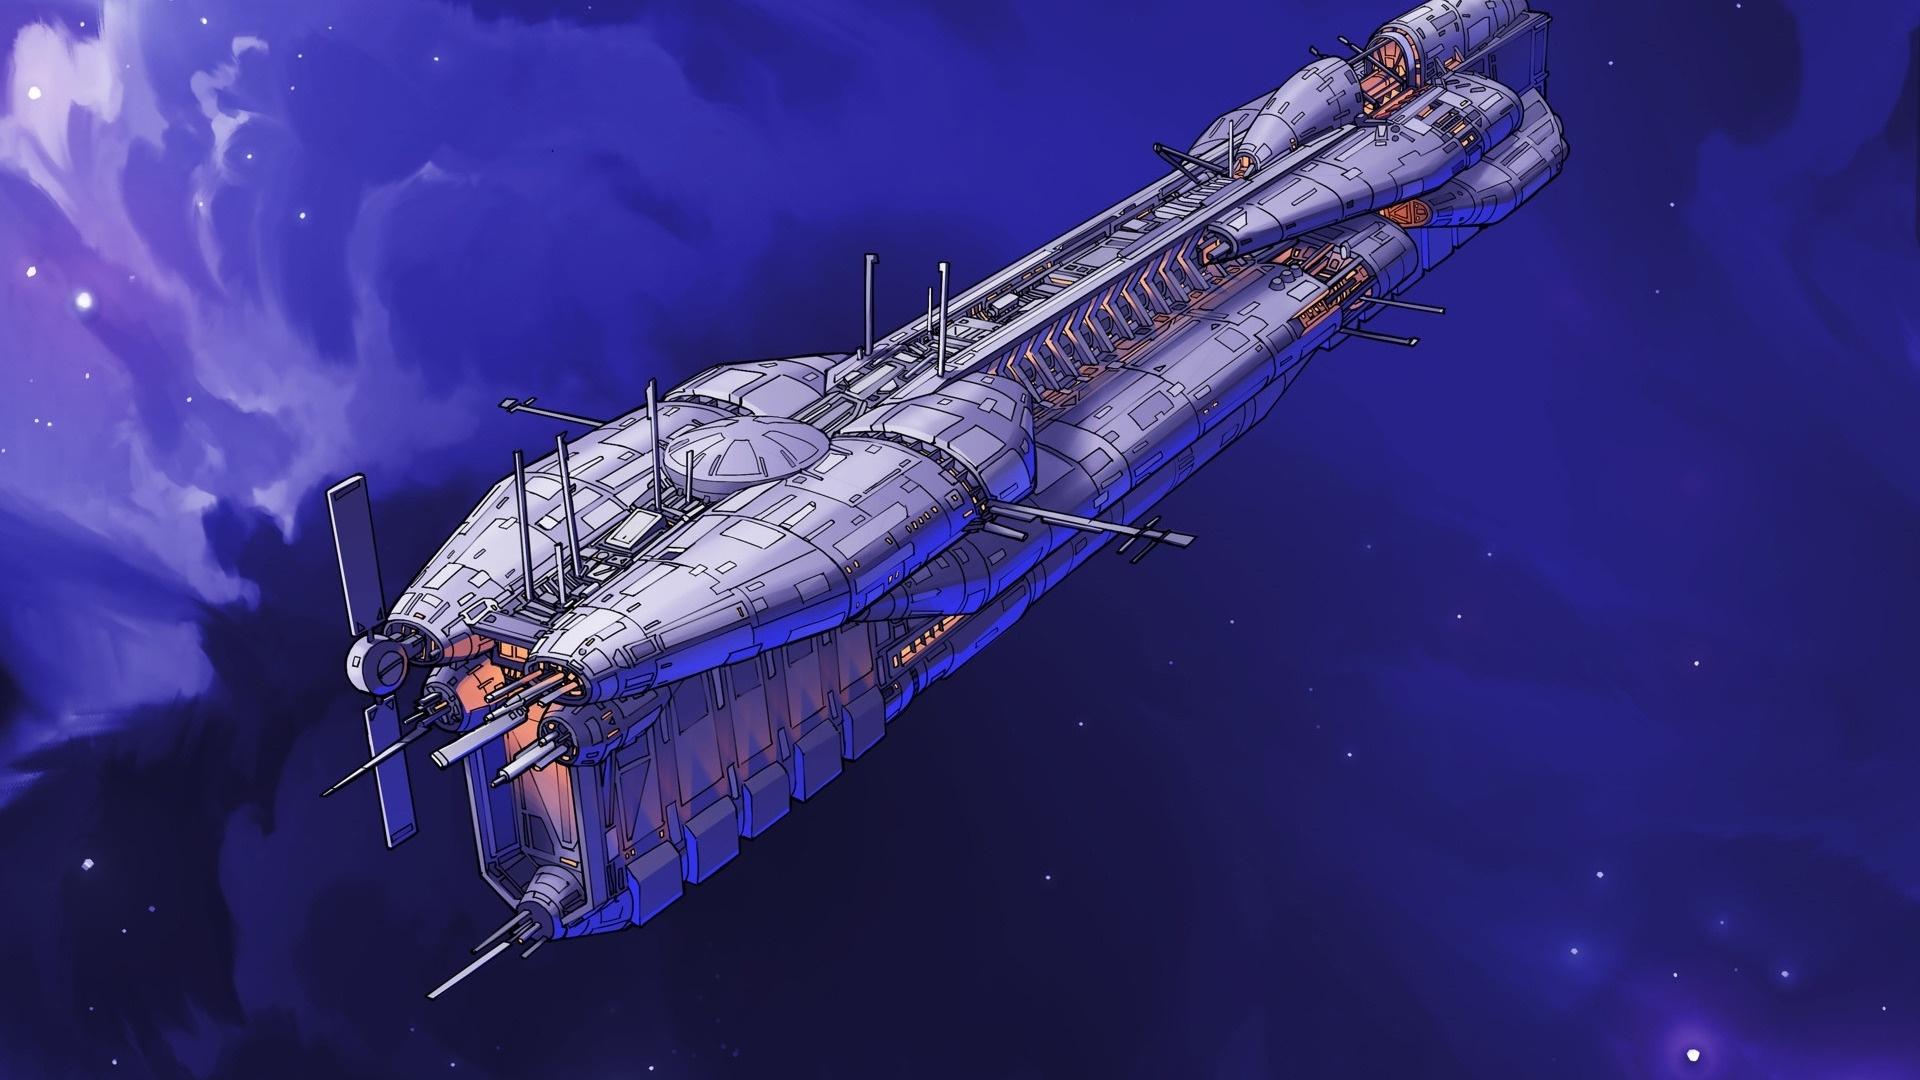 Spaceships Art Pic